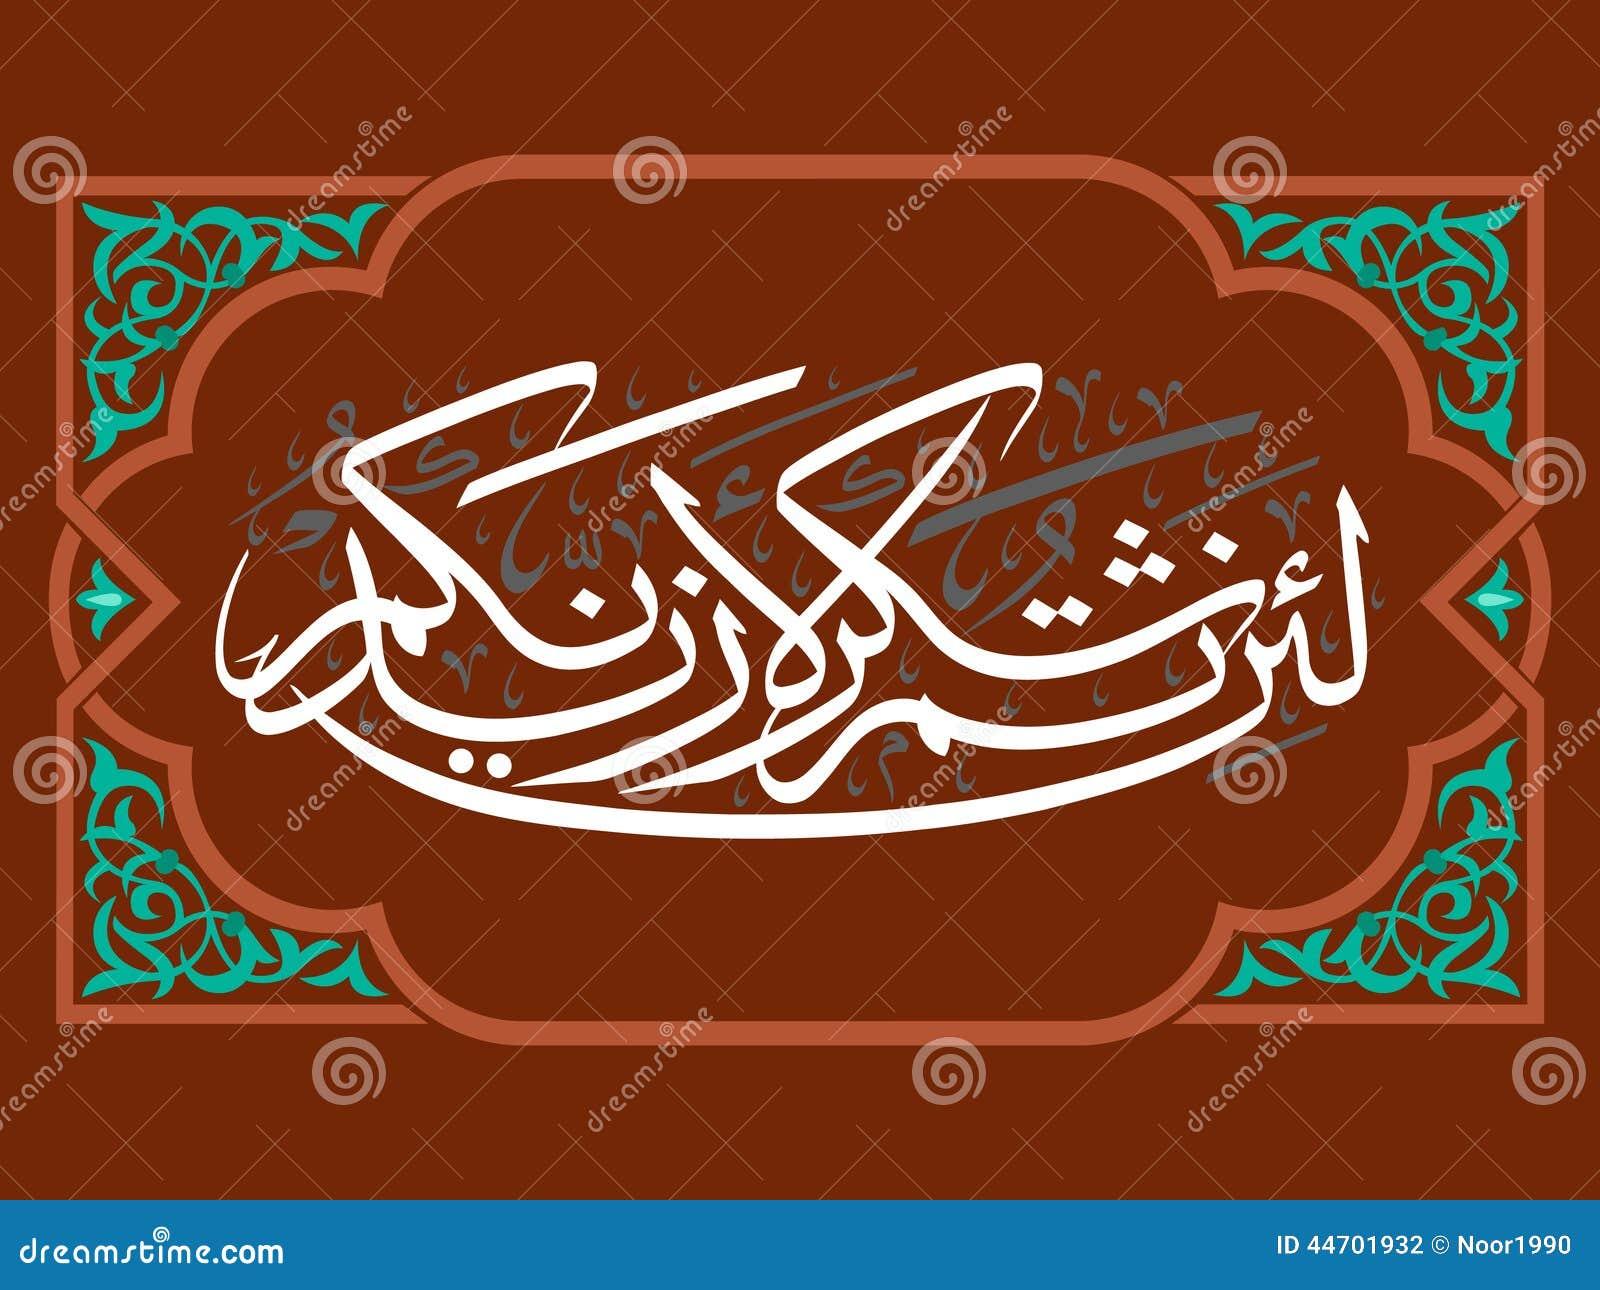 Quran Verse Thank God Stock Vector Image 44701932